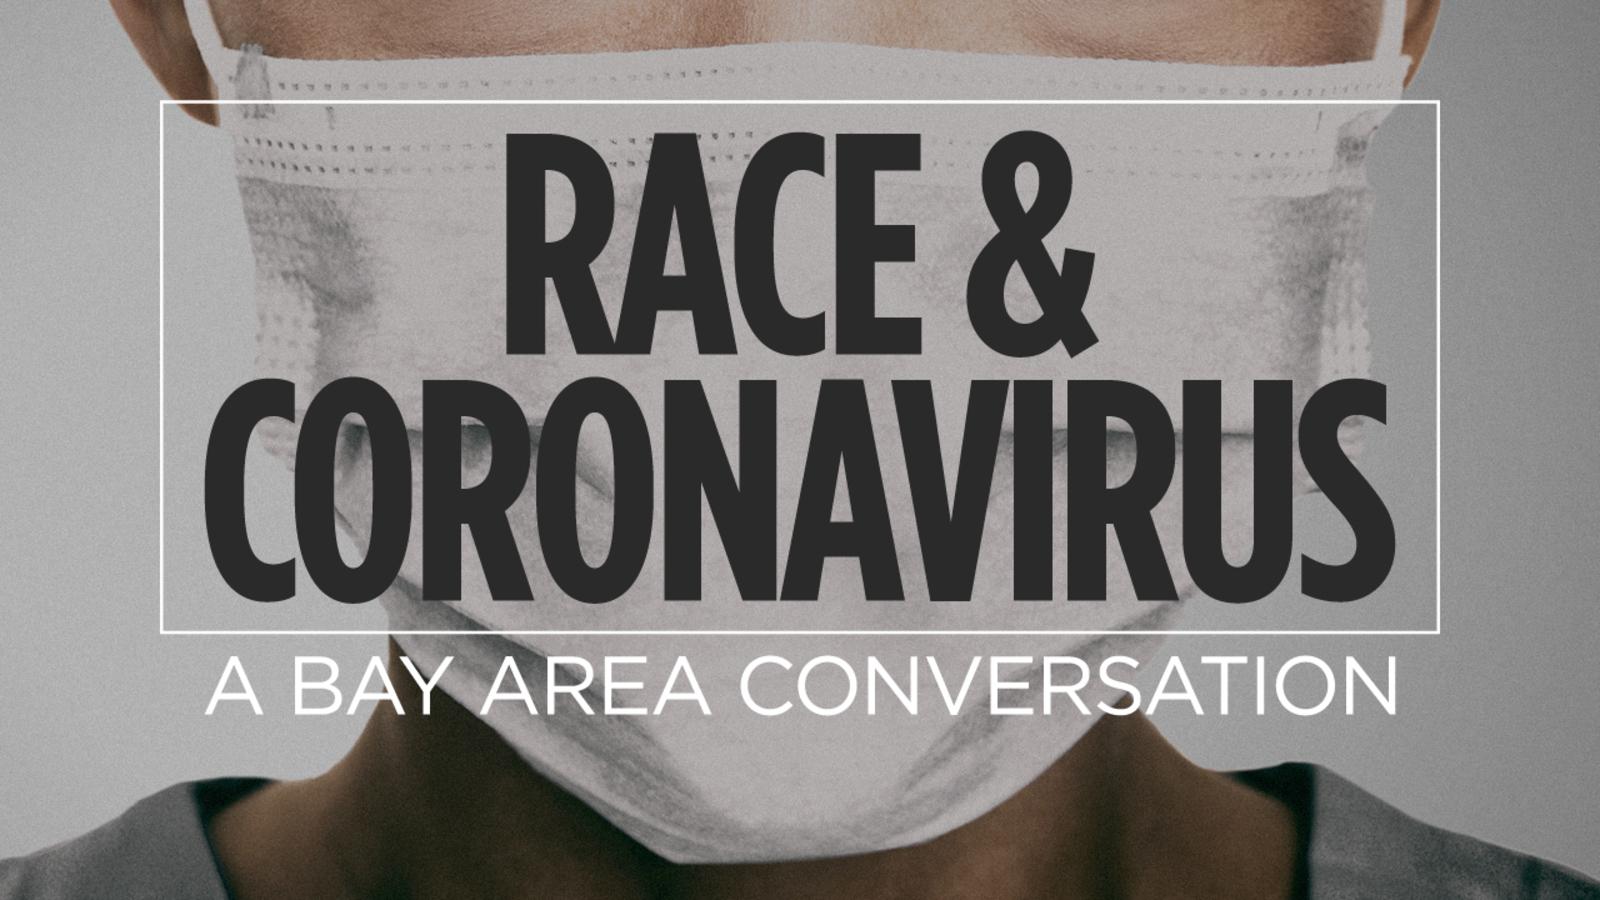 abc7news.com: WATCH: 'Race & Coronavirus: A Bay Area Conversation' virtual town hall about COVID-19 impact on Asian American community